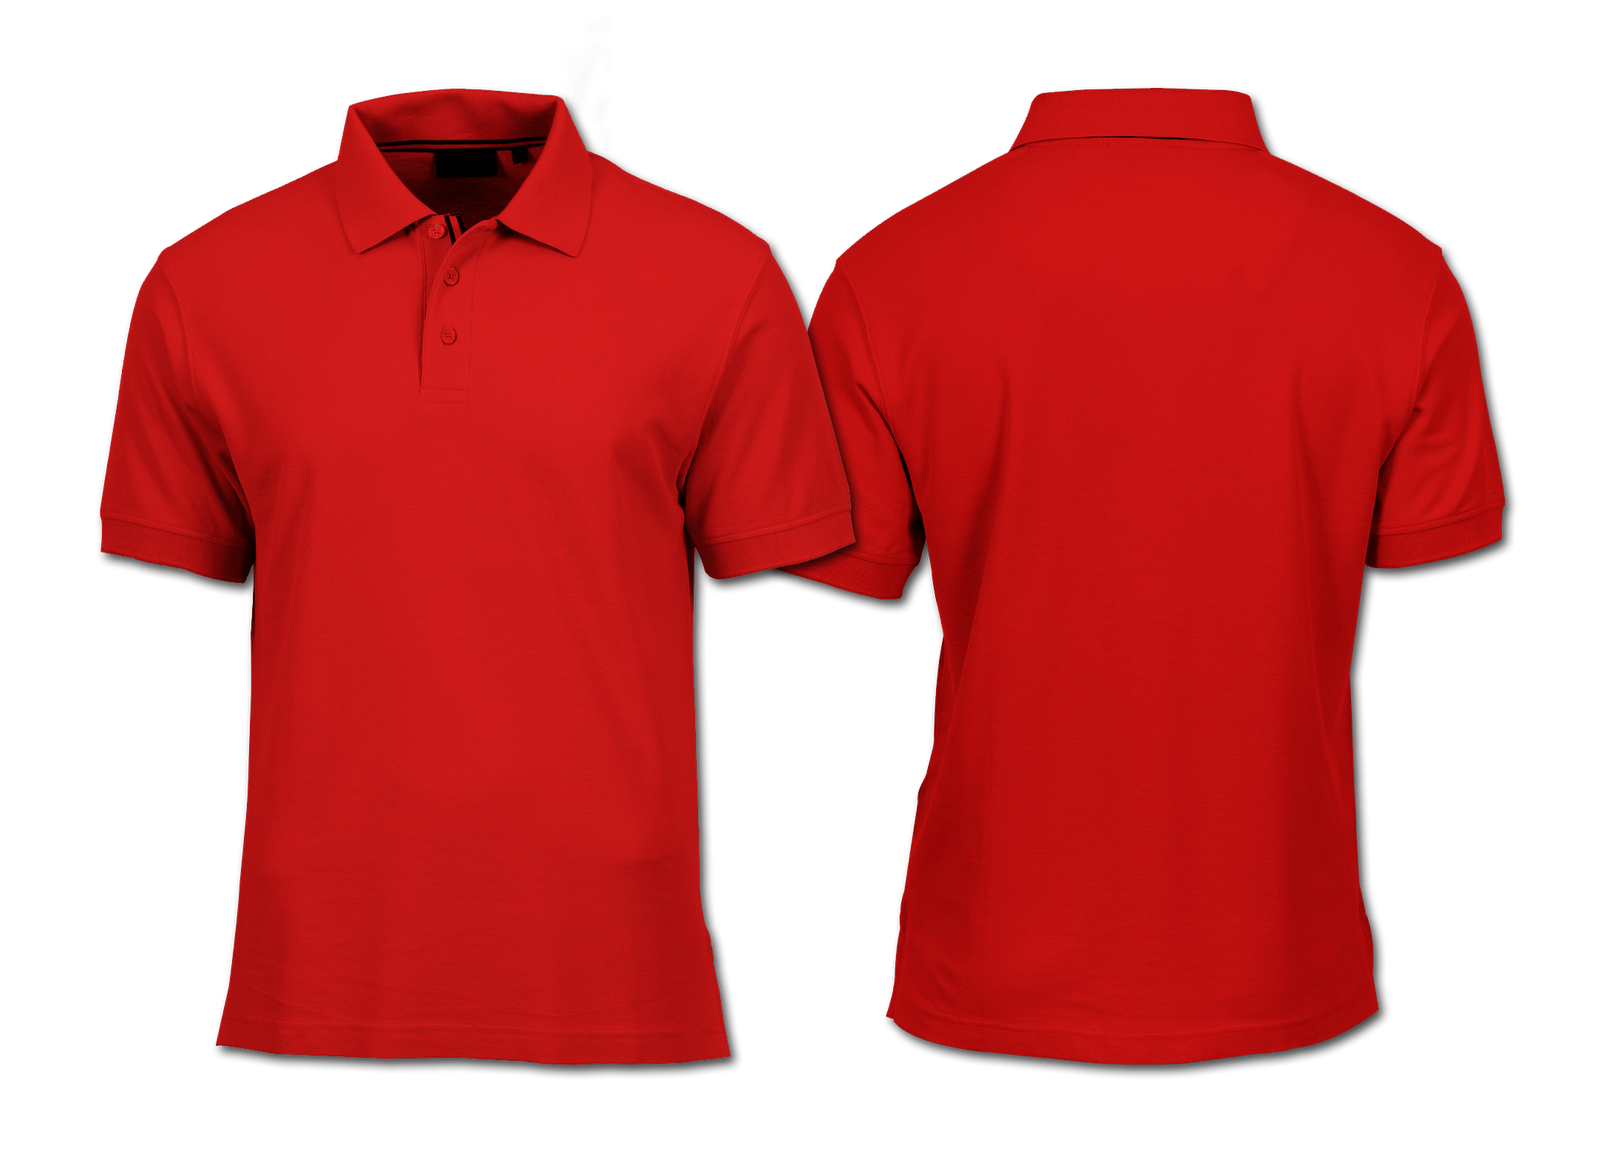 Polo shirt design editor - Mock Up Polo Shirt